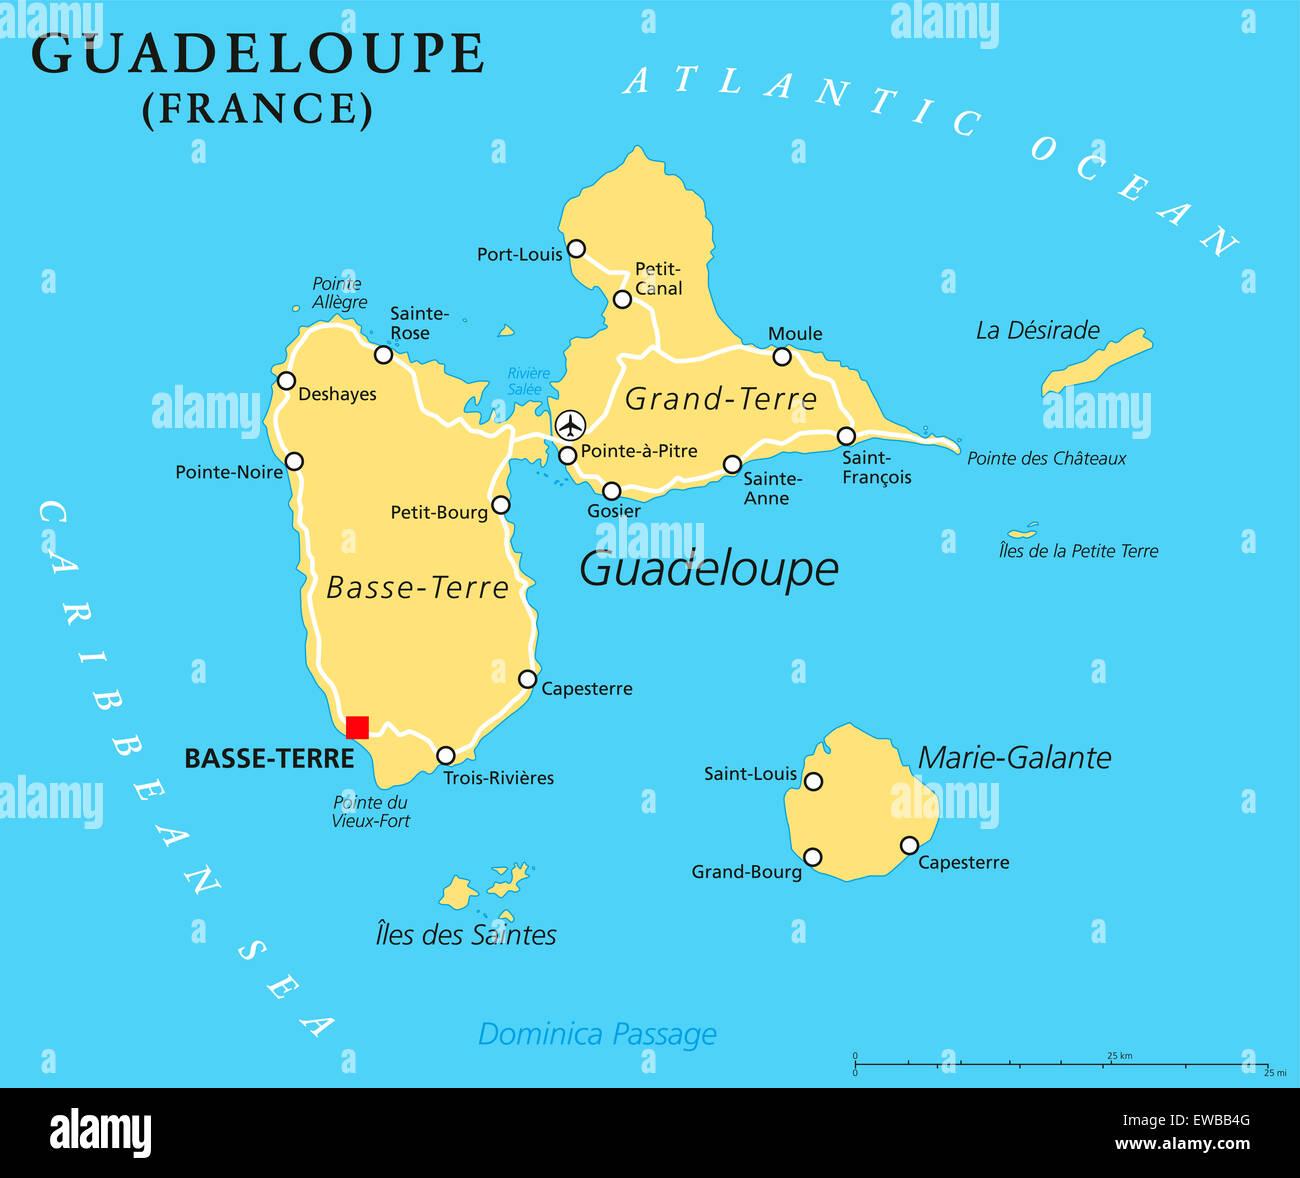 guadeloupe karte Guadeloupe politische Karte mit Hauptstadt Basse Terre